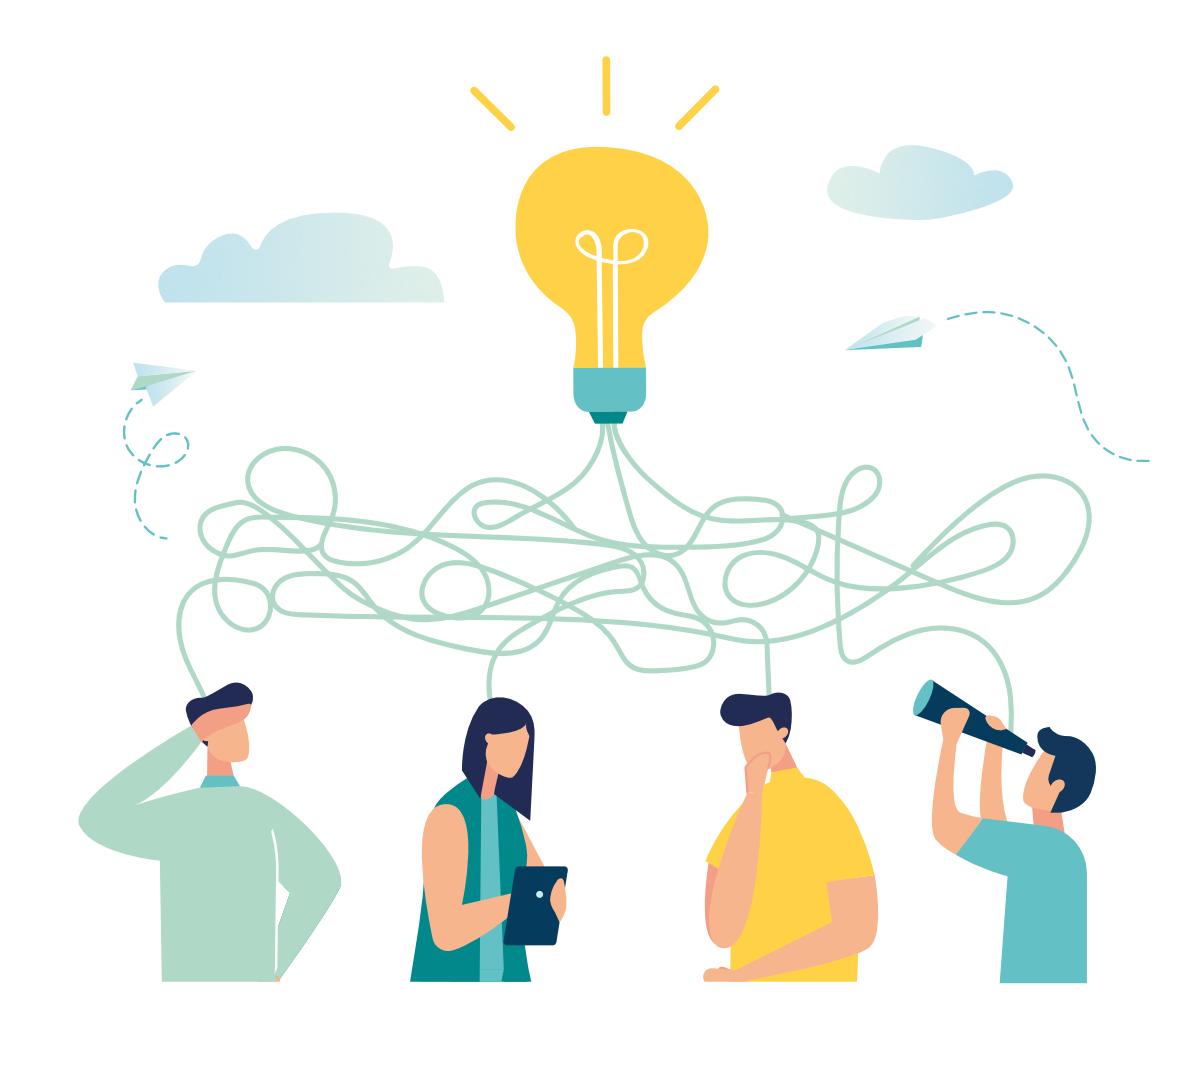 Illustration of lightbulb & work colleagues